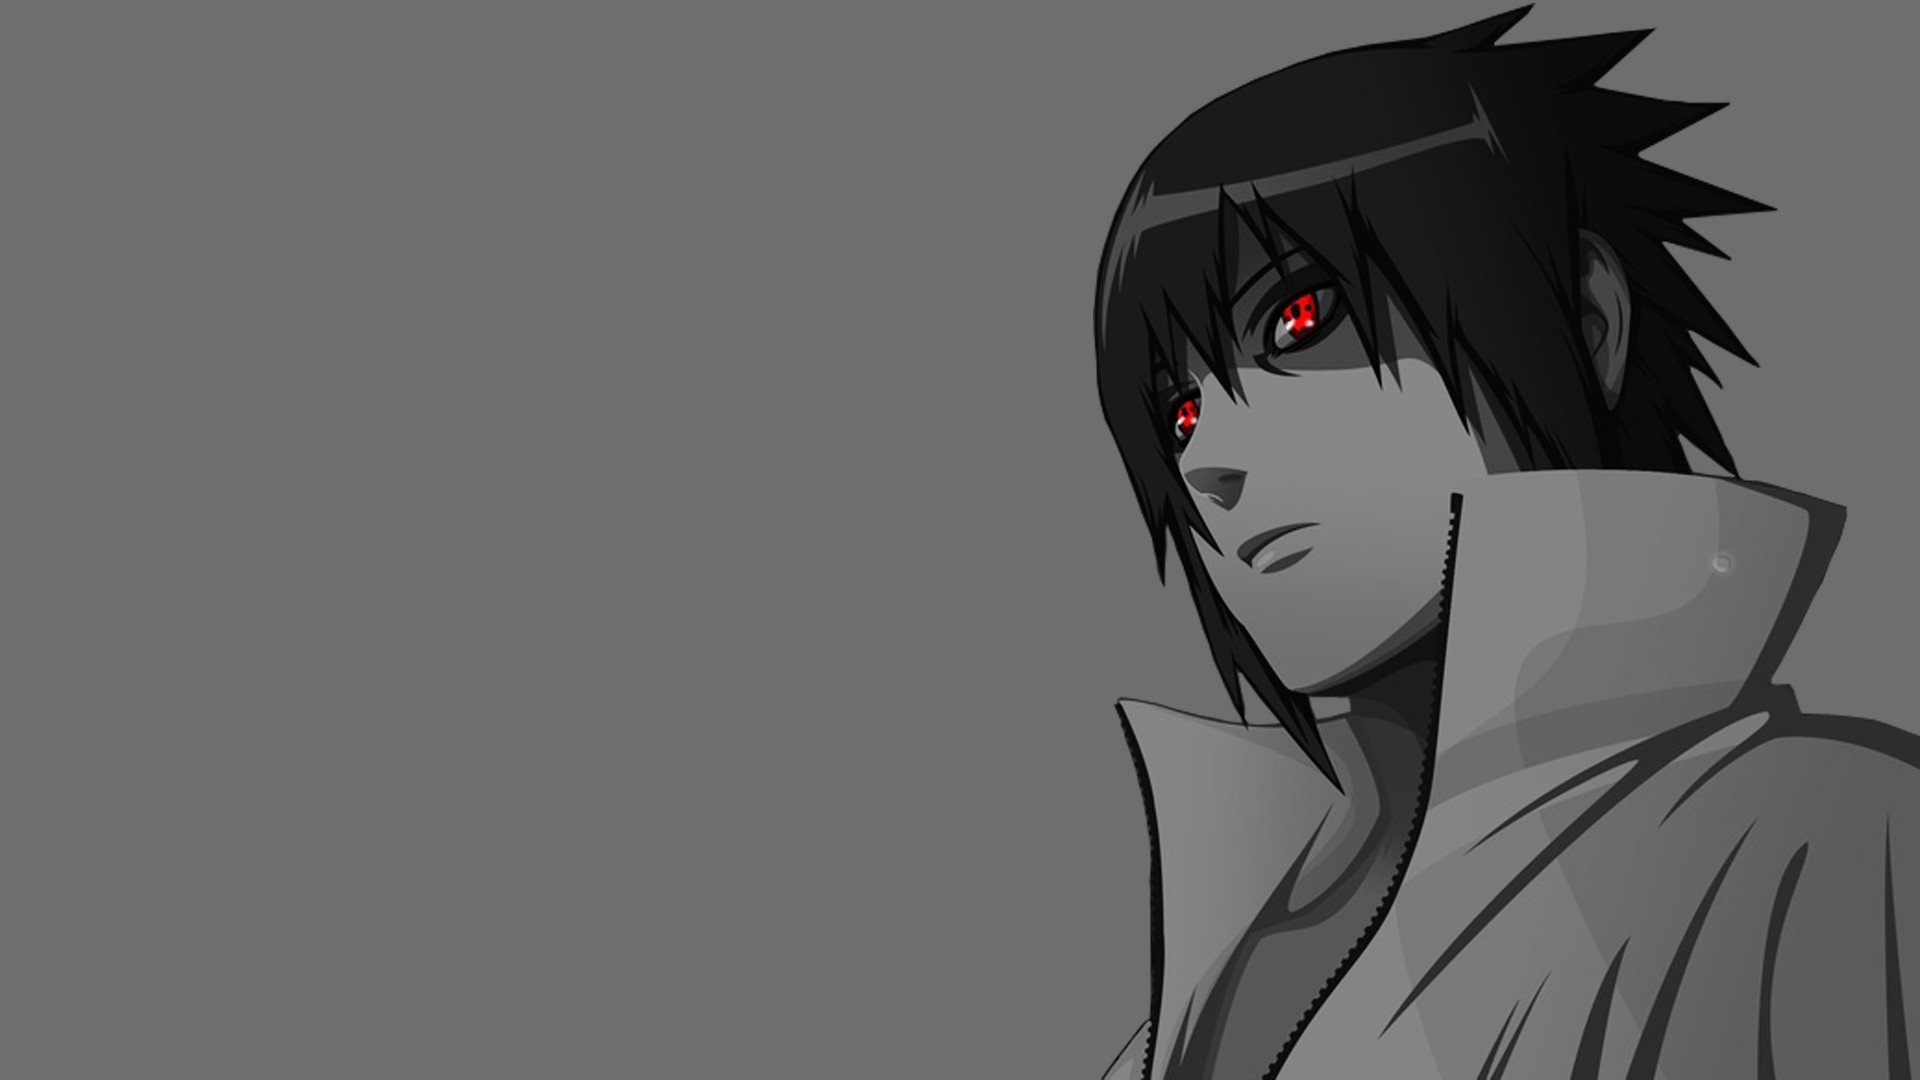 Sasuke pc wallpaper